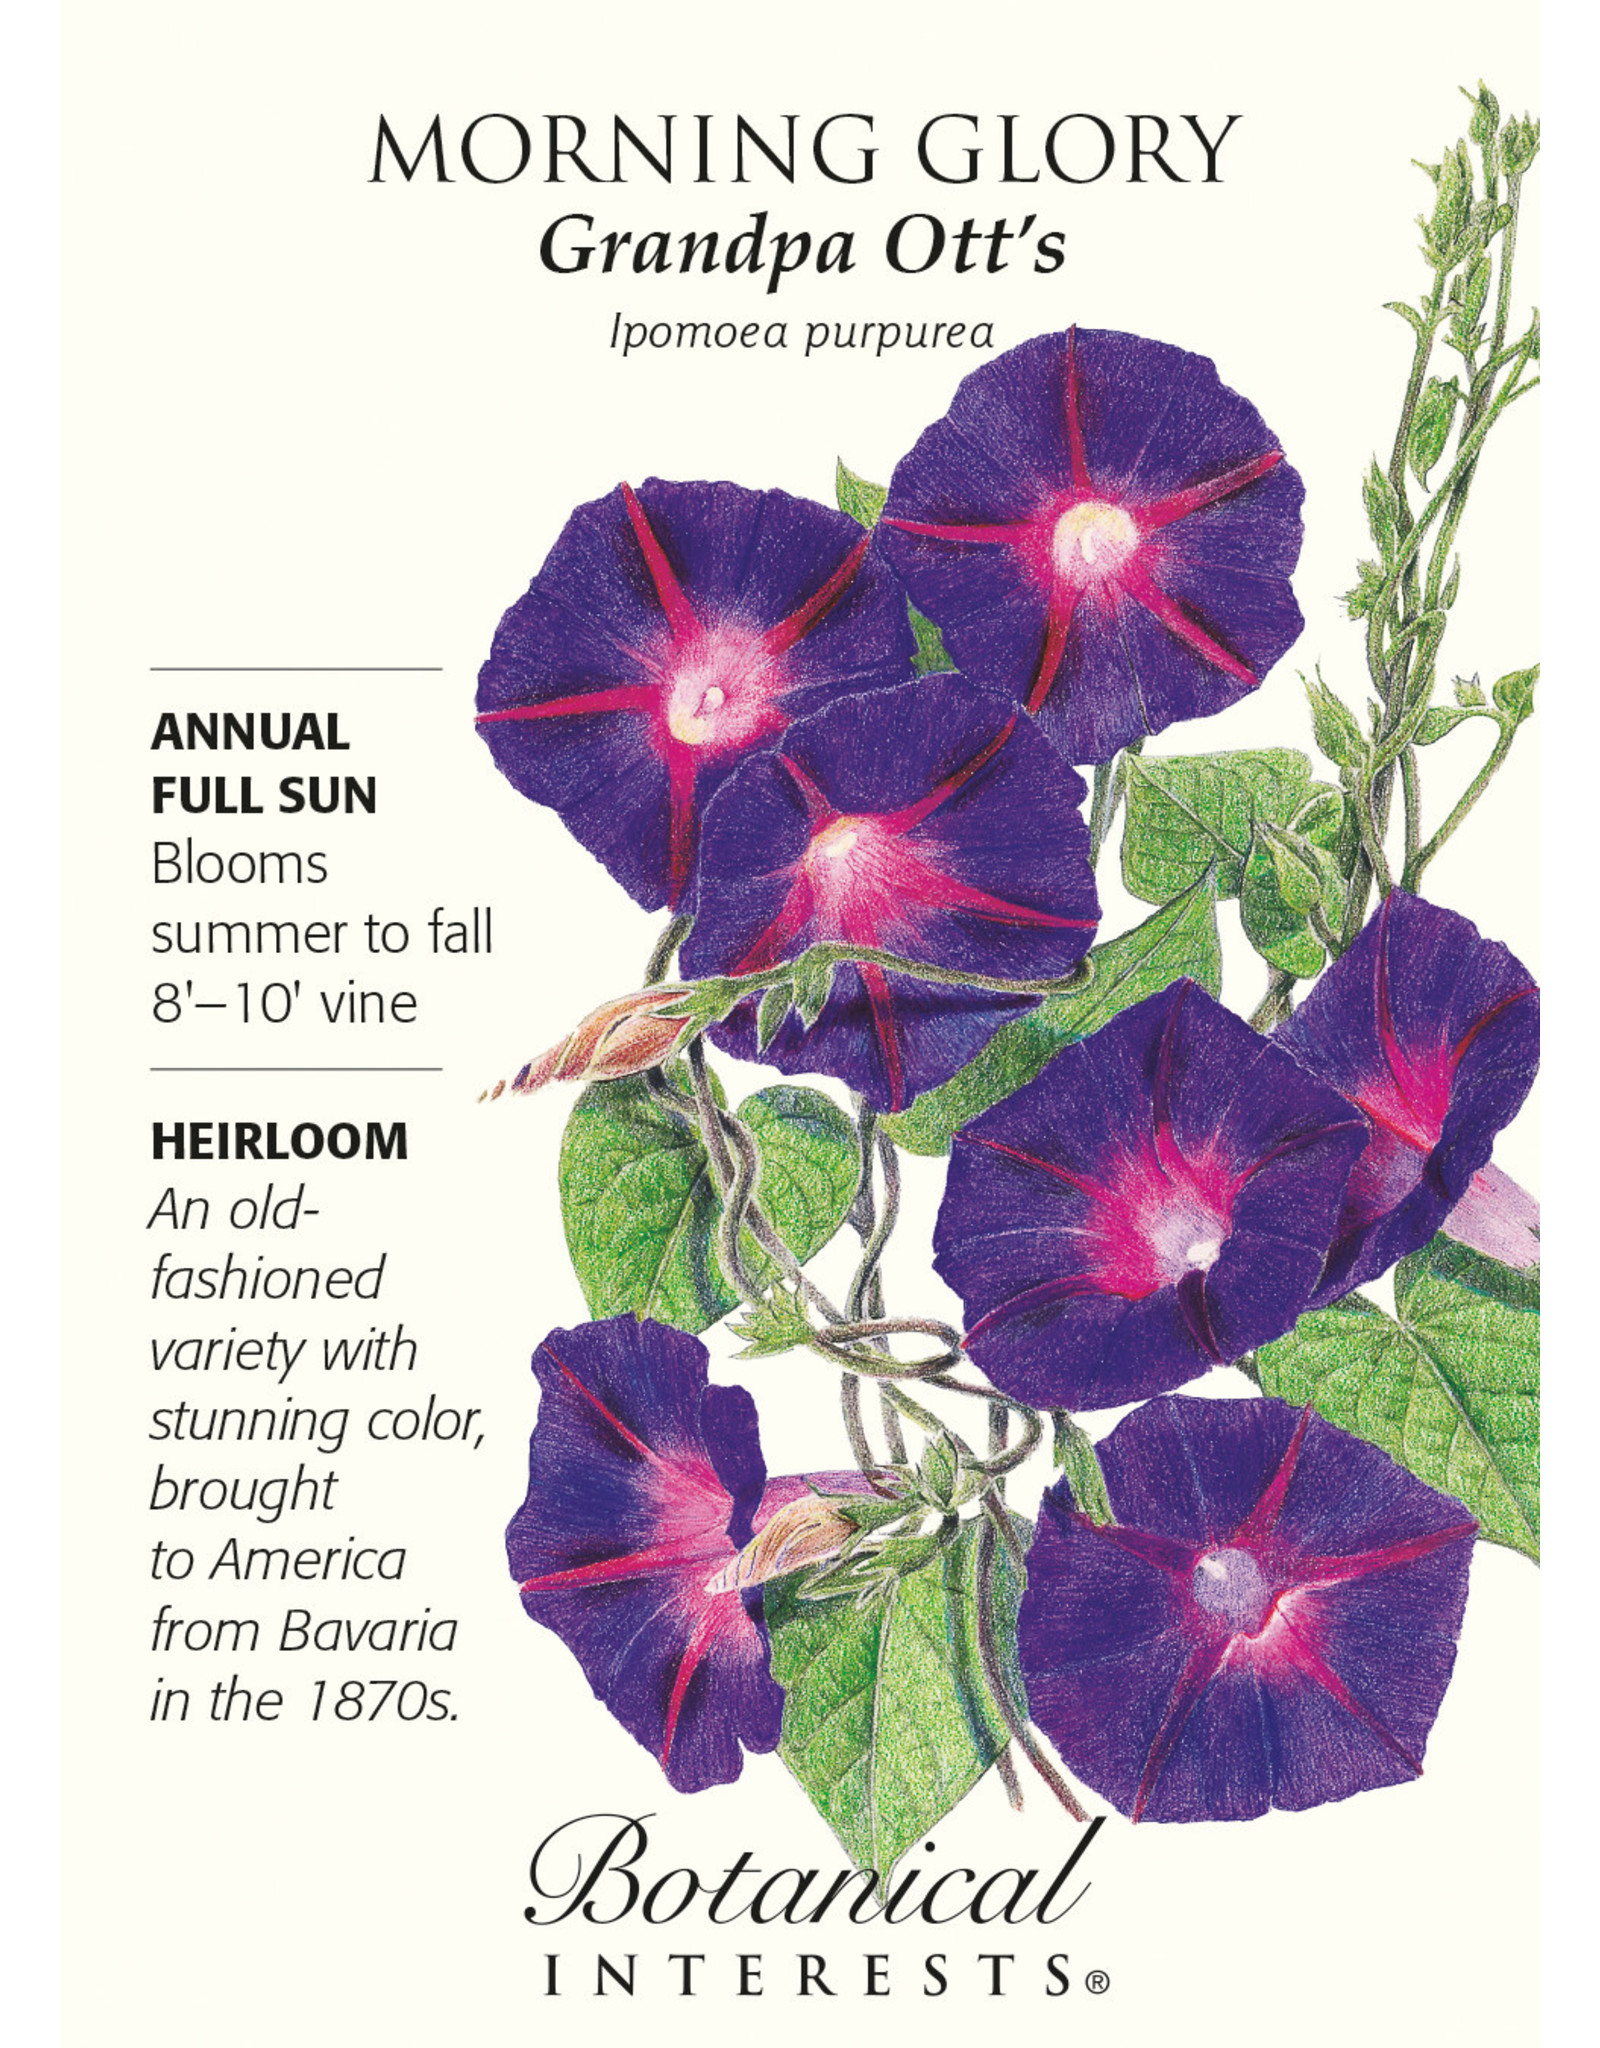 Seeds - Morning Glory Grandpa Ott's